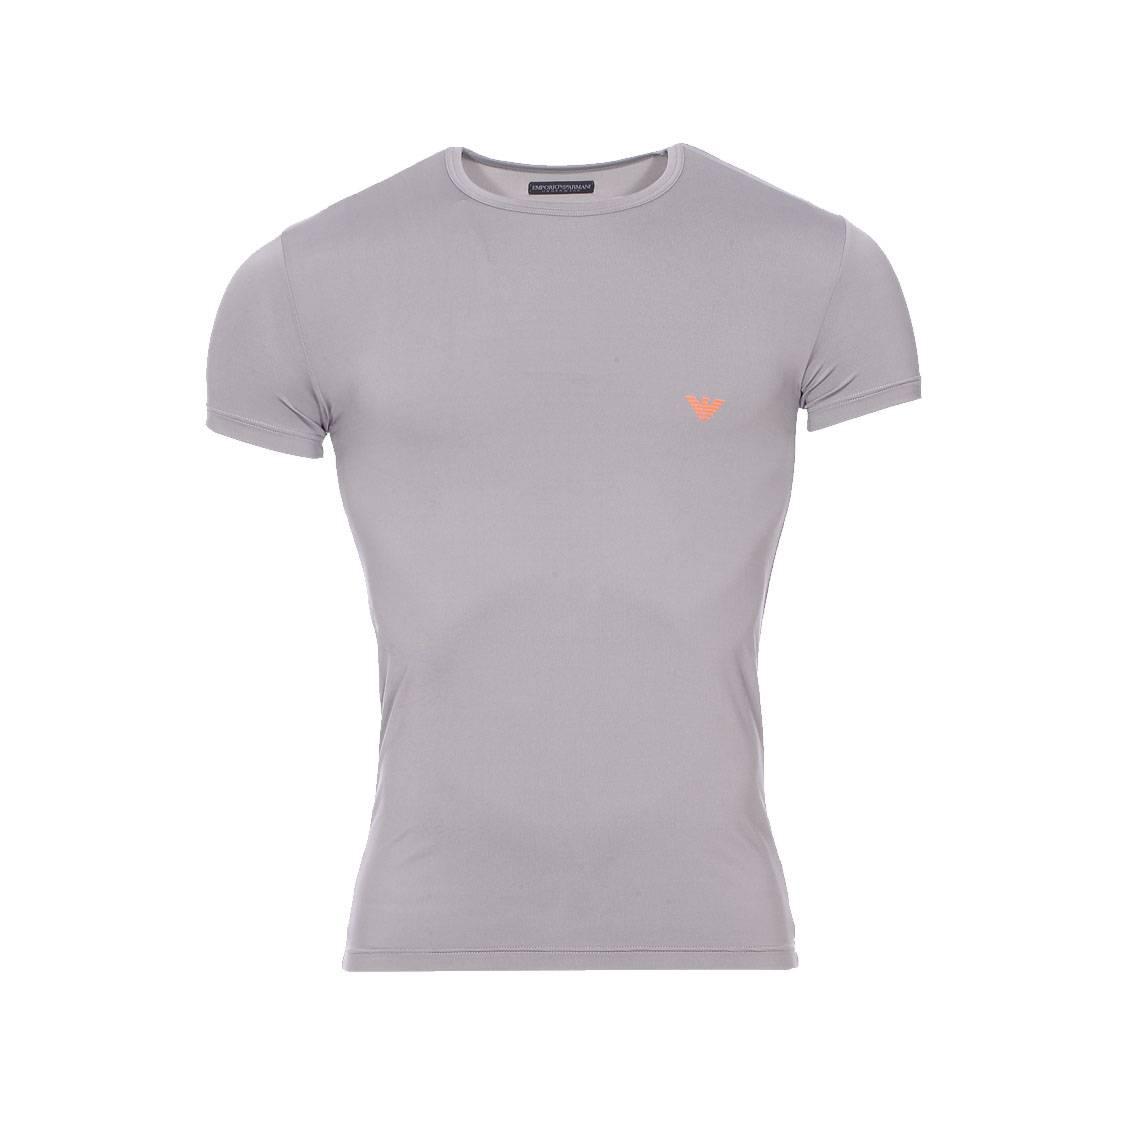 Tee-shirt col rond  en polyamide stretch gris acier à logo orange